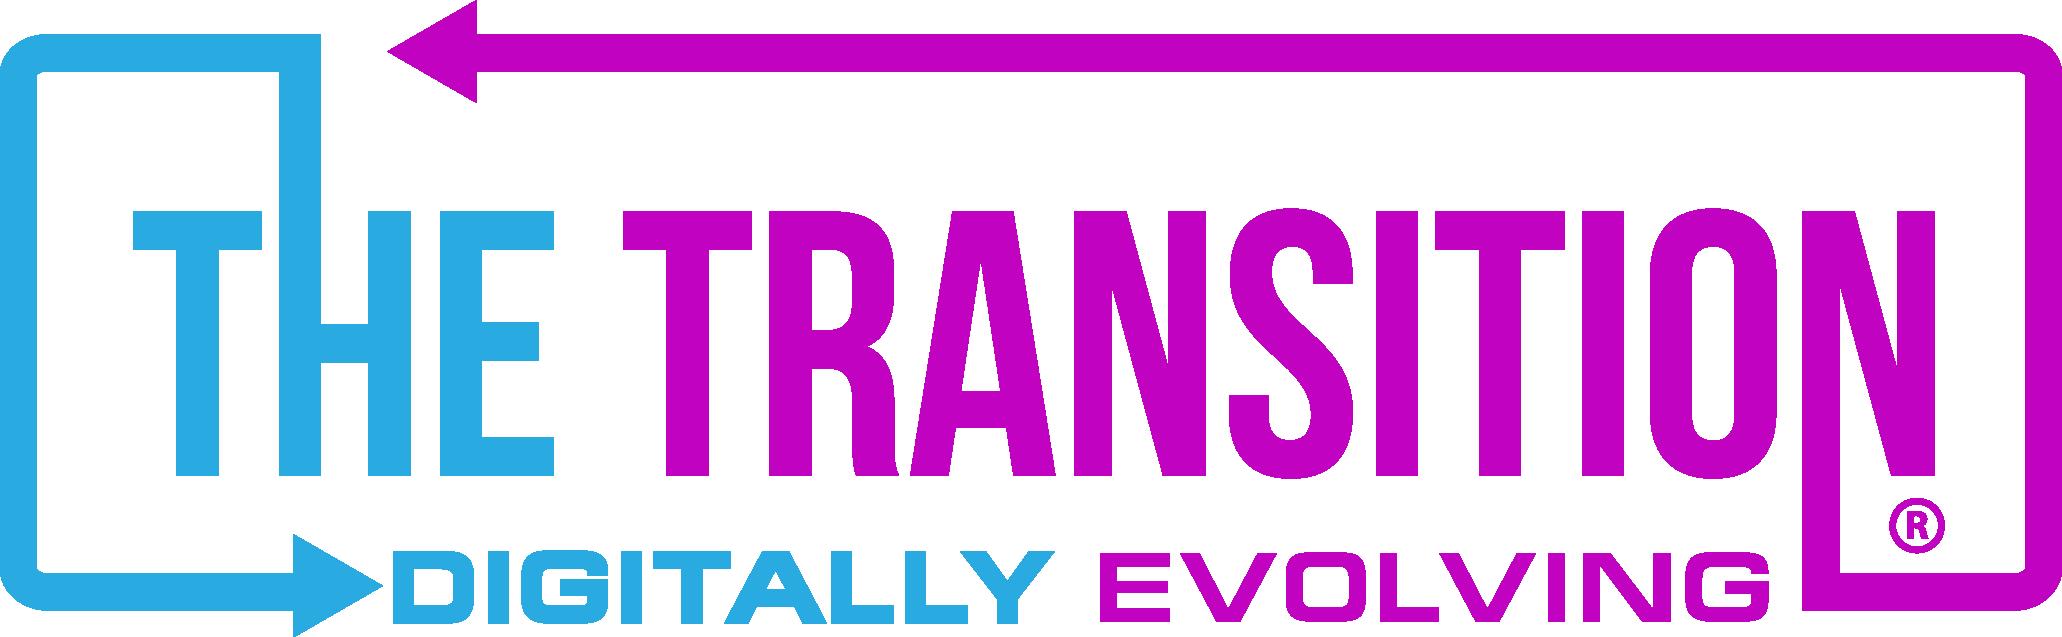 The Transition: Digitally Evolving